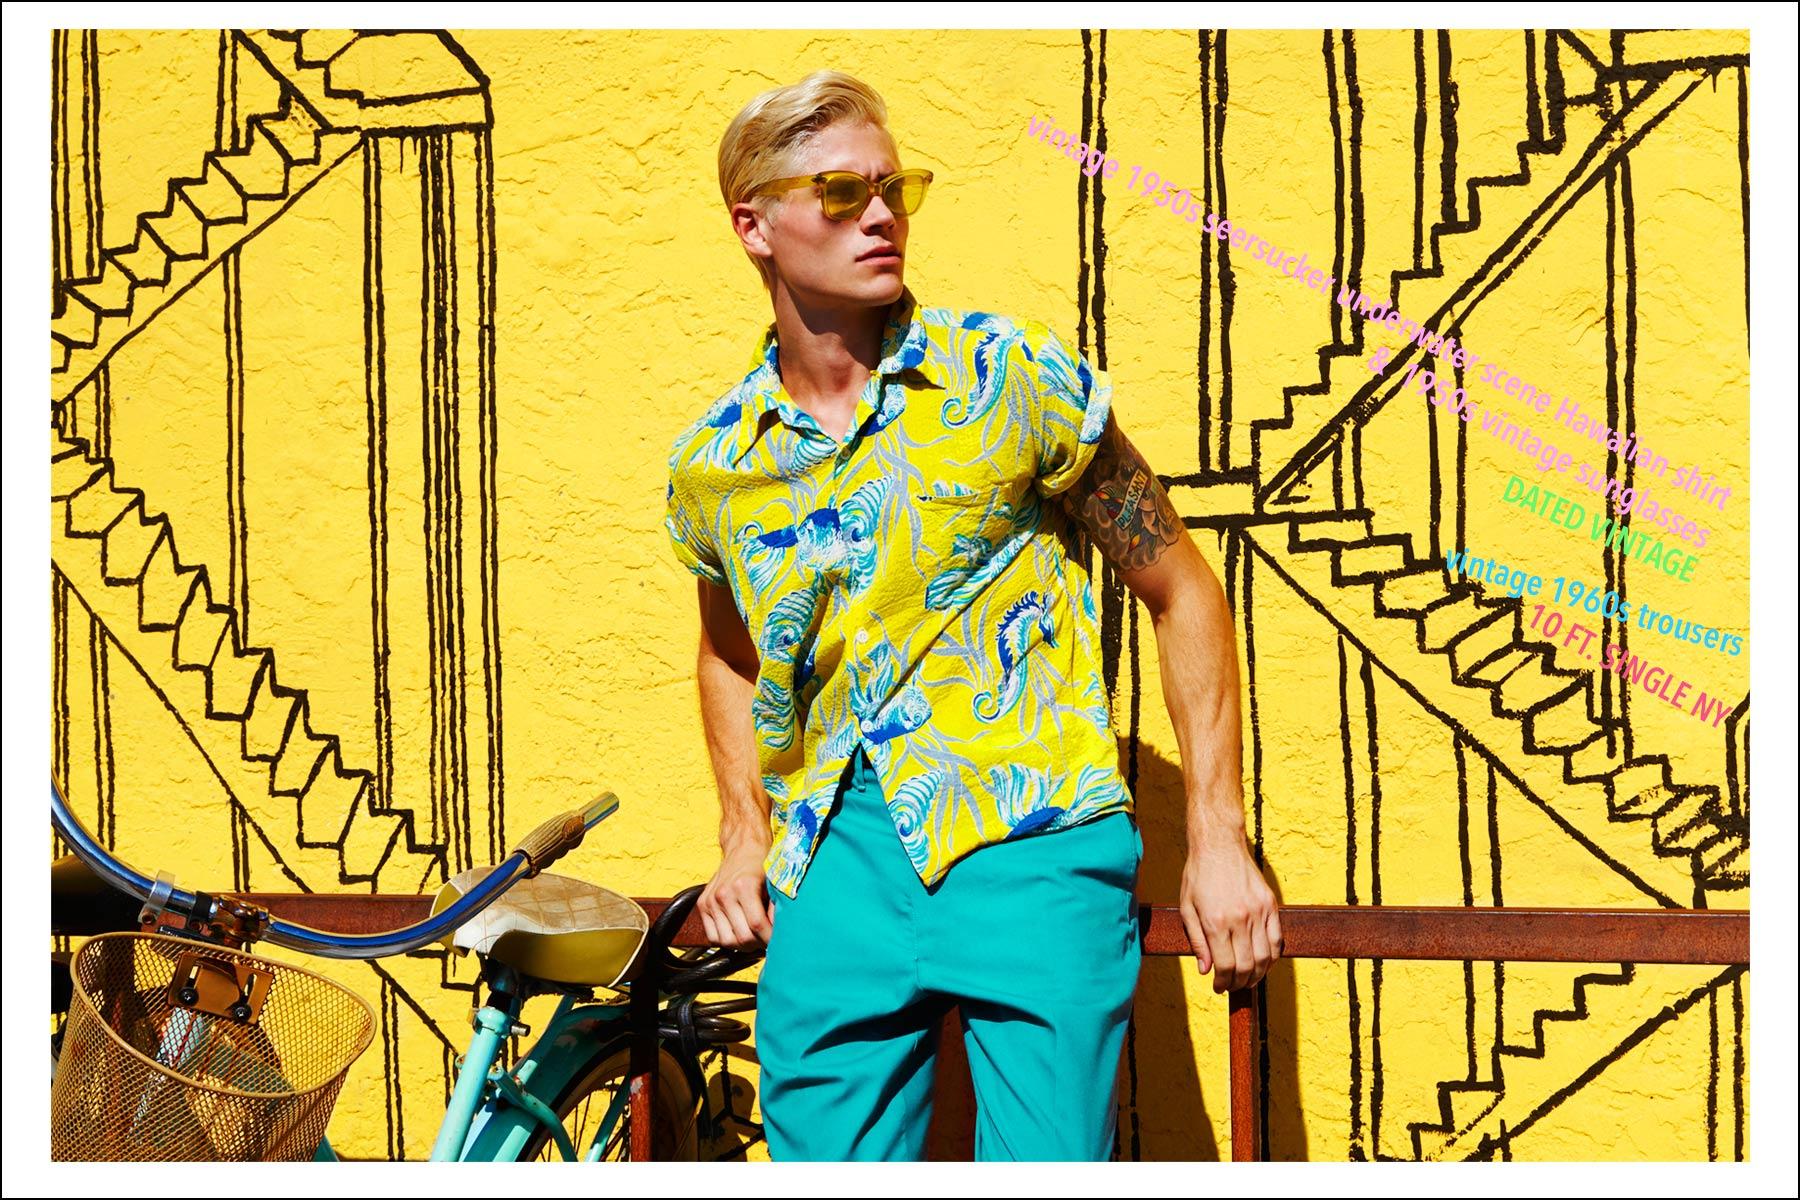 Male model Jake Filling photographed for Ponyboy magazine NY vintage menswear editorial, Rockin Rockaways by Alexander Thompson.